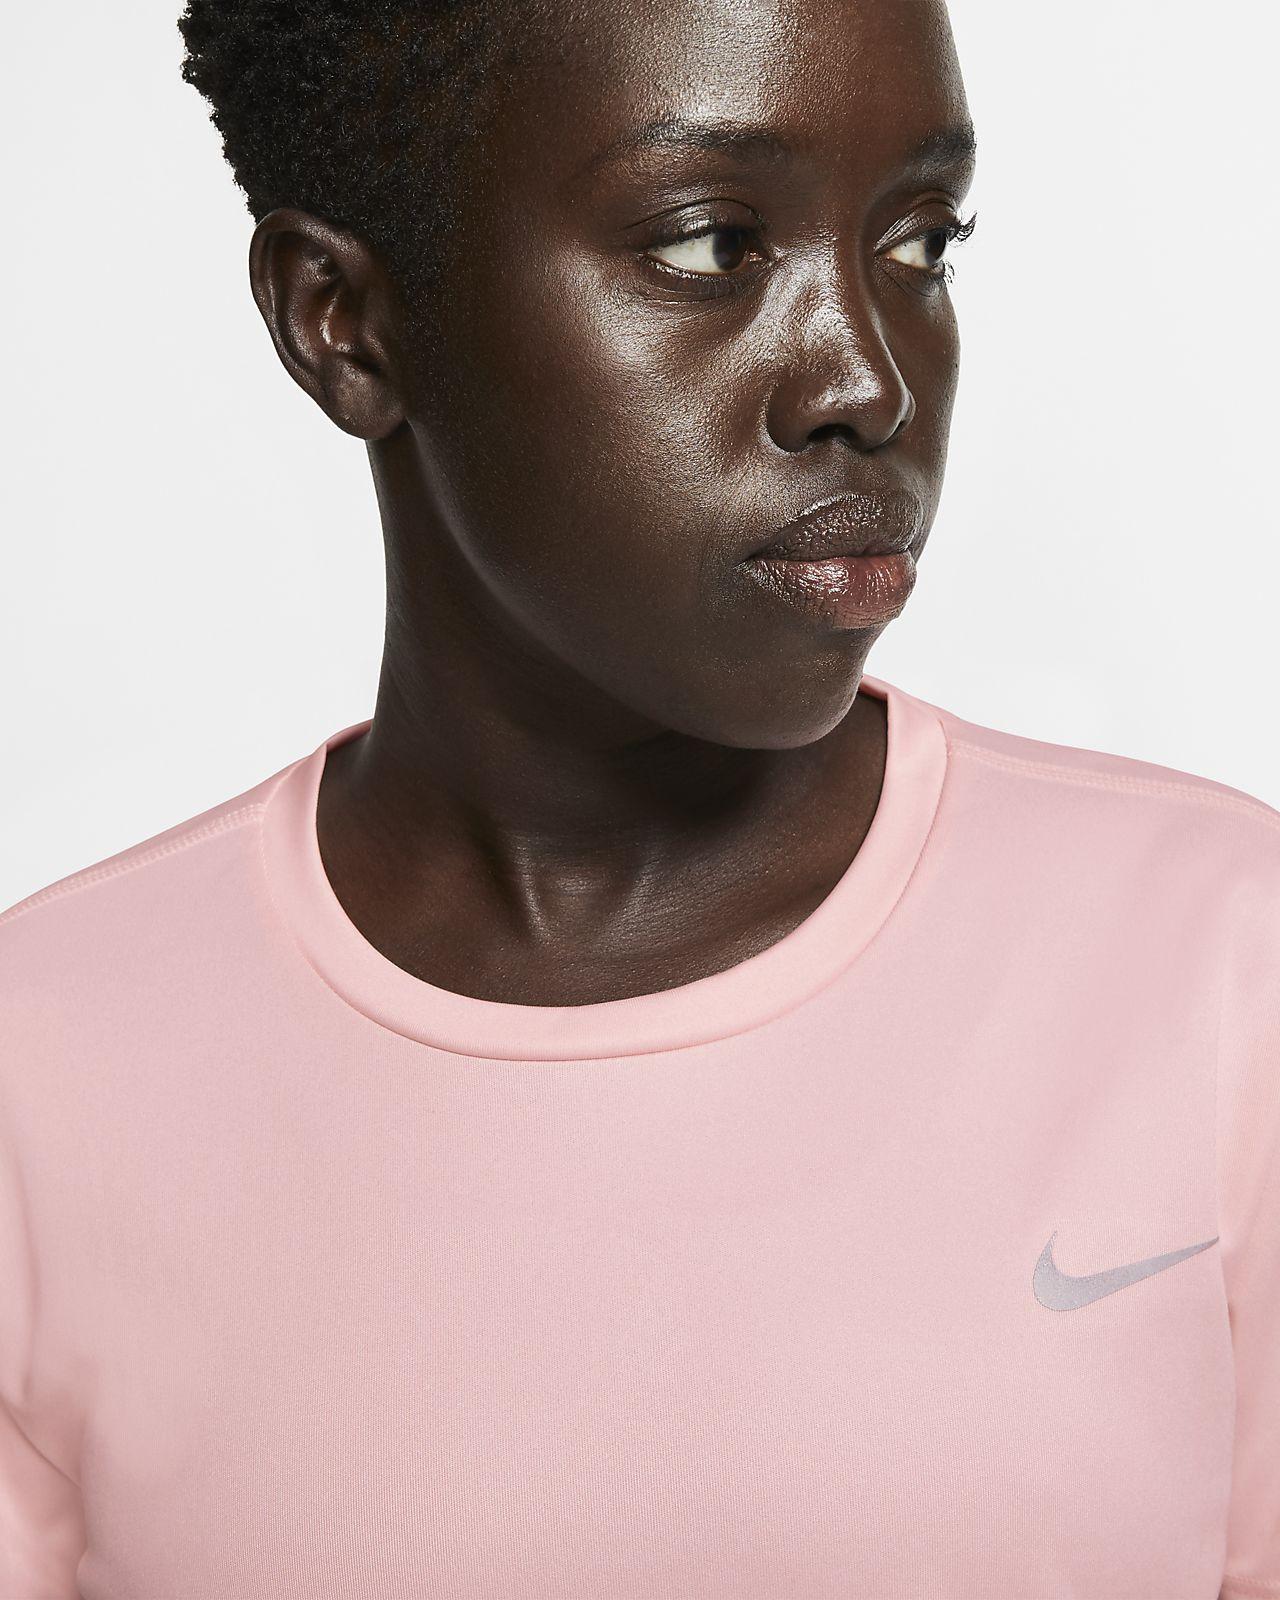 523be68155c84b Camisola de running de manga curta Nike Miler para mulher